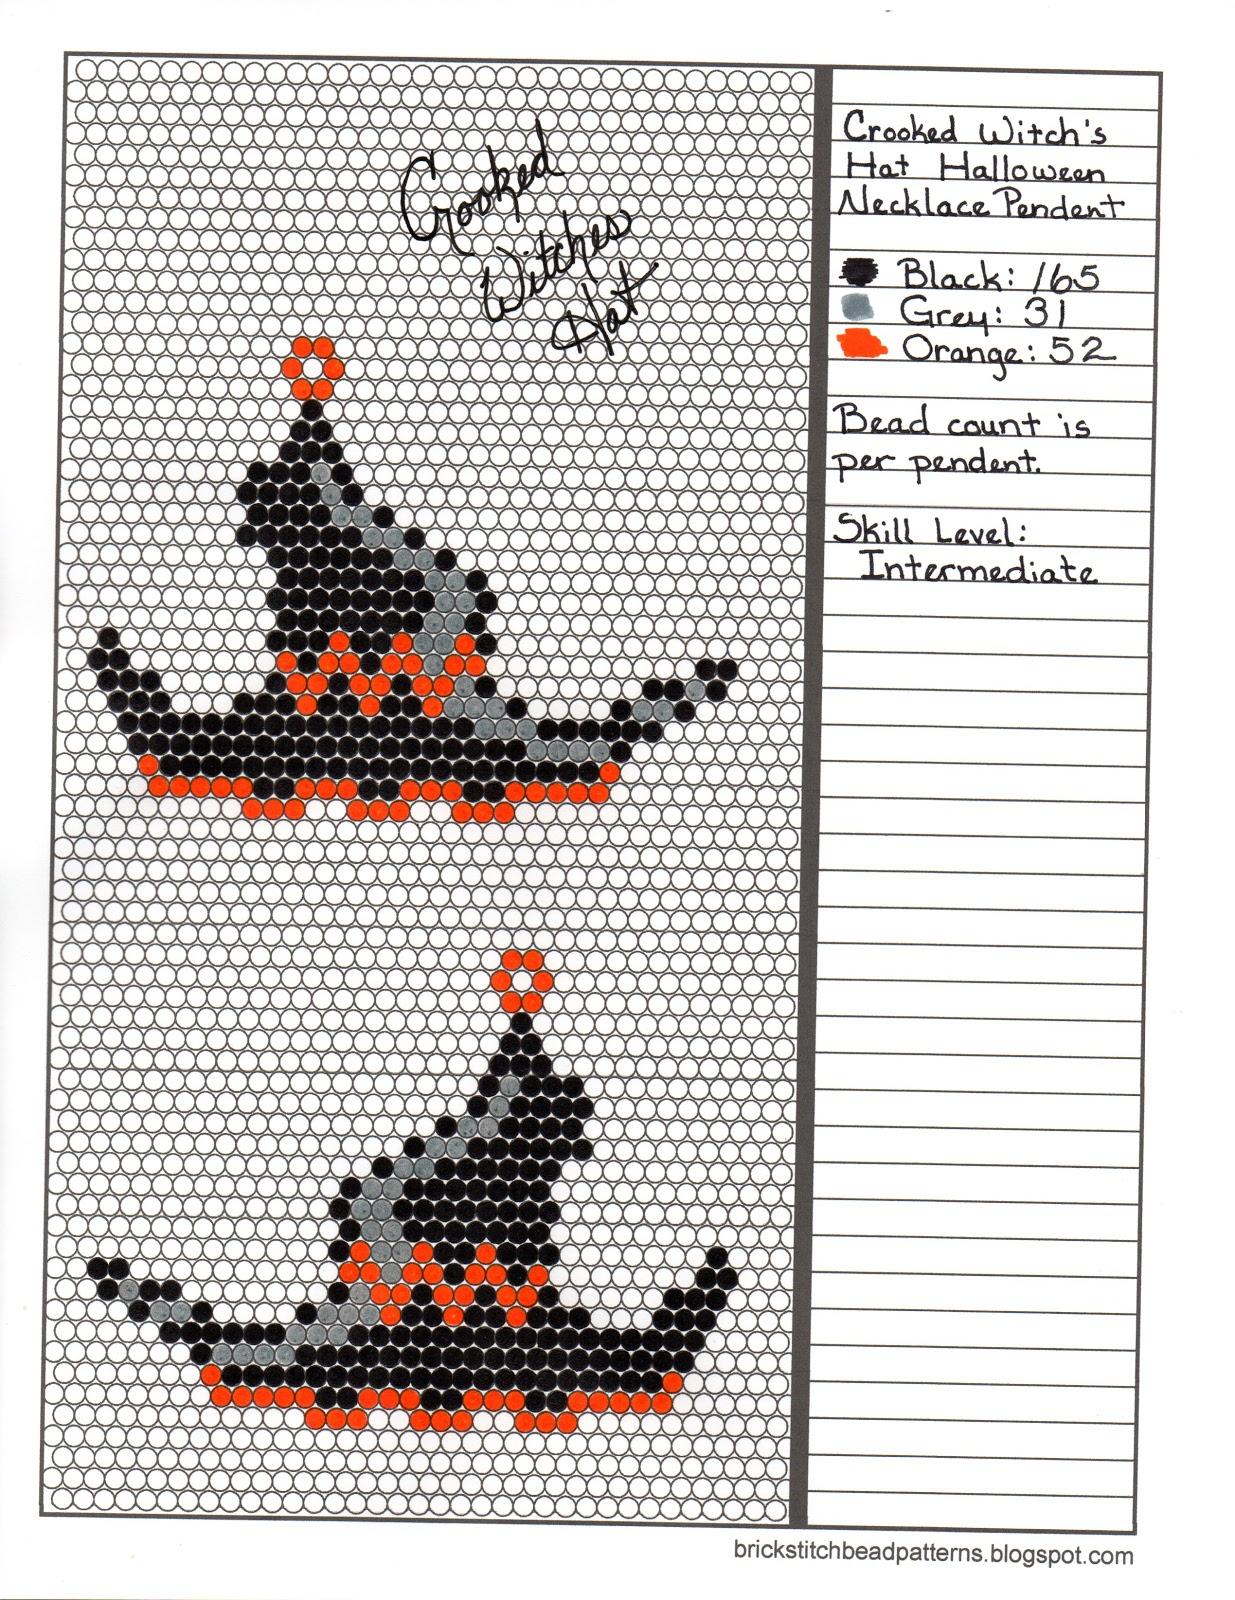 5ae74a47ec6 Brick Stitch Bead Patterns Journal  Crooked Witch s Hat Free Brick ...